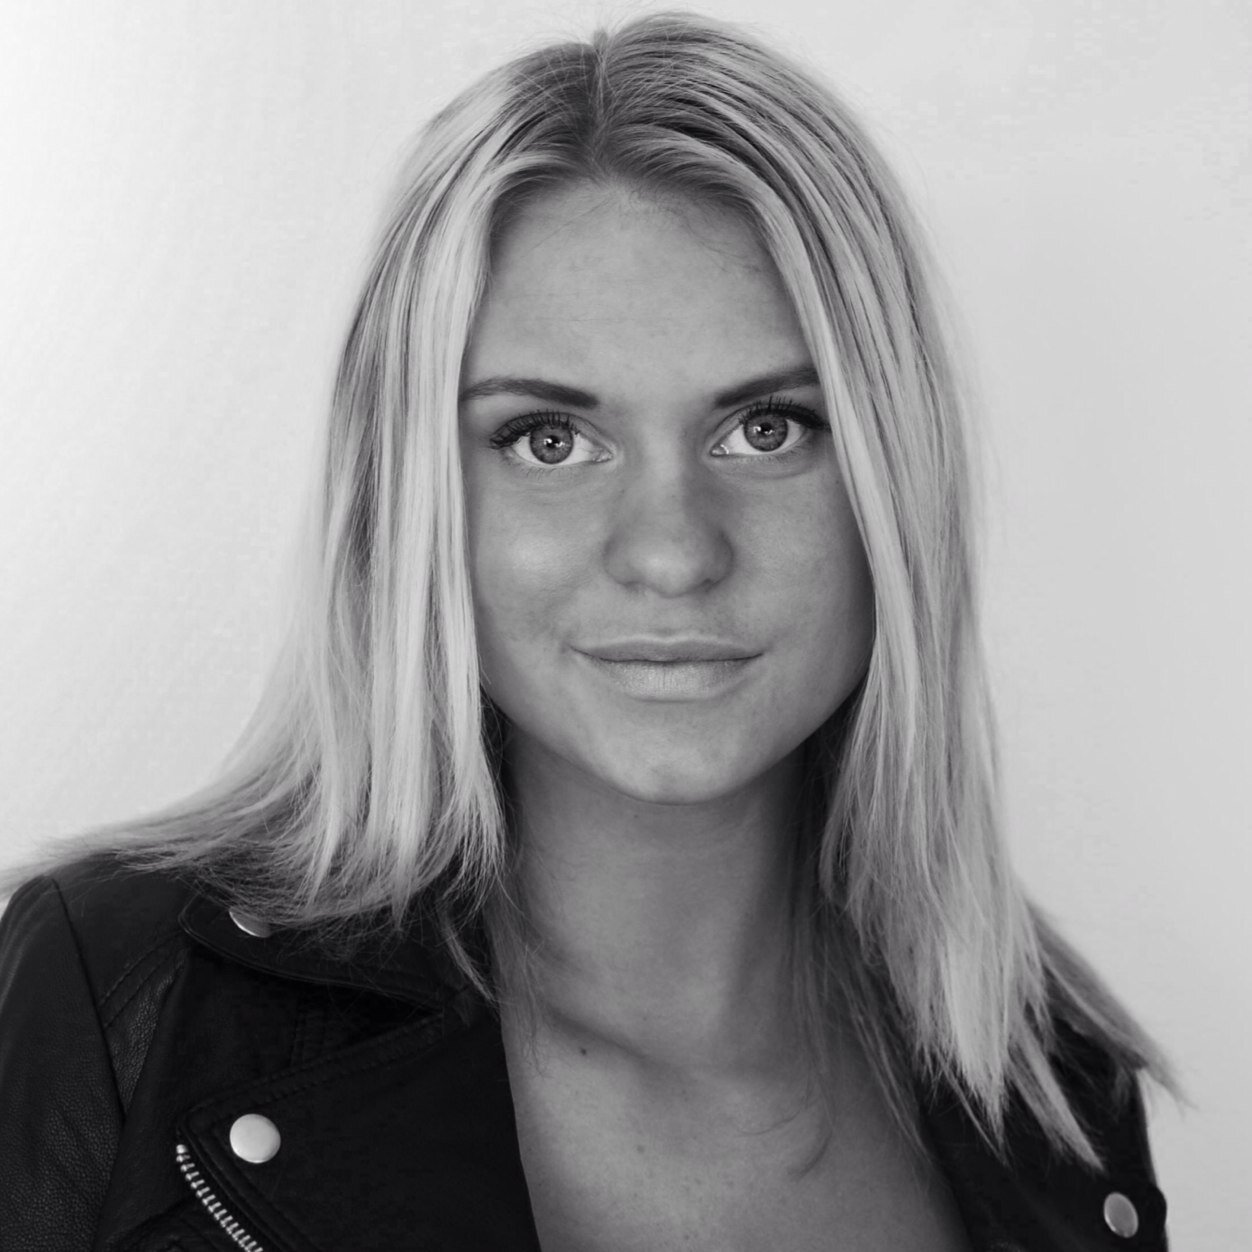 Tova Magnusson Nude Photos